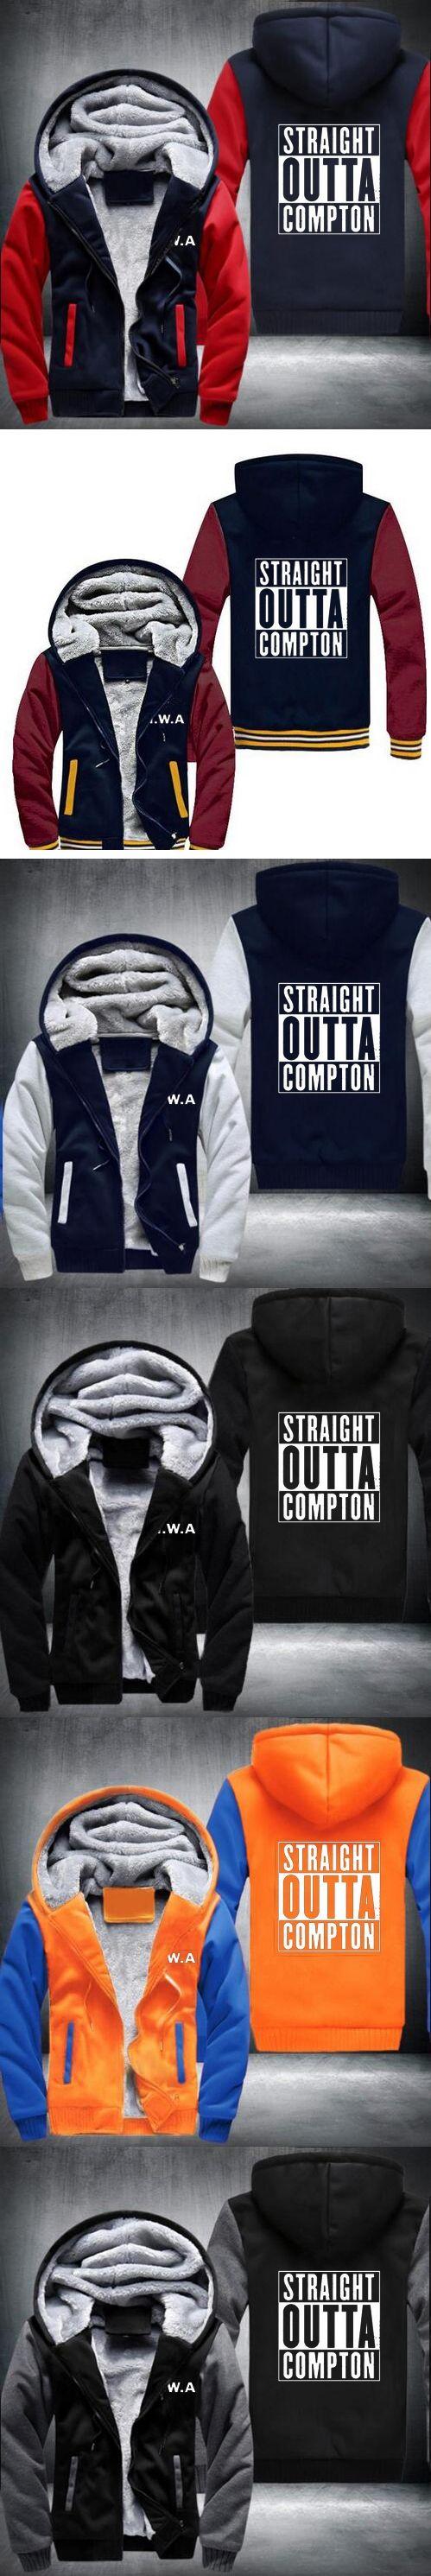 new style Straight Outta Compton NWA California GOTHIC Eazy E NWA Dr. Dre Hoodies men Thicken Fleece Coat USA EU size